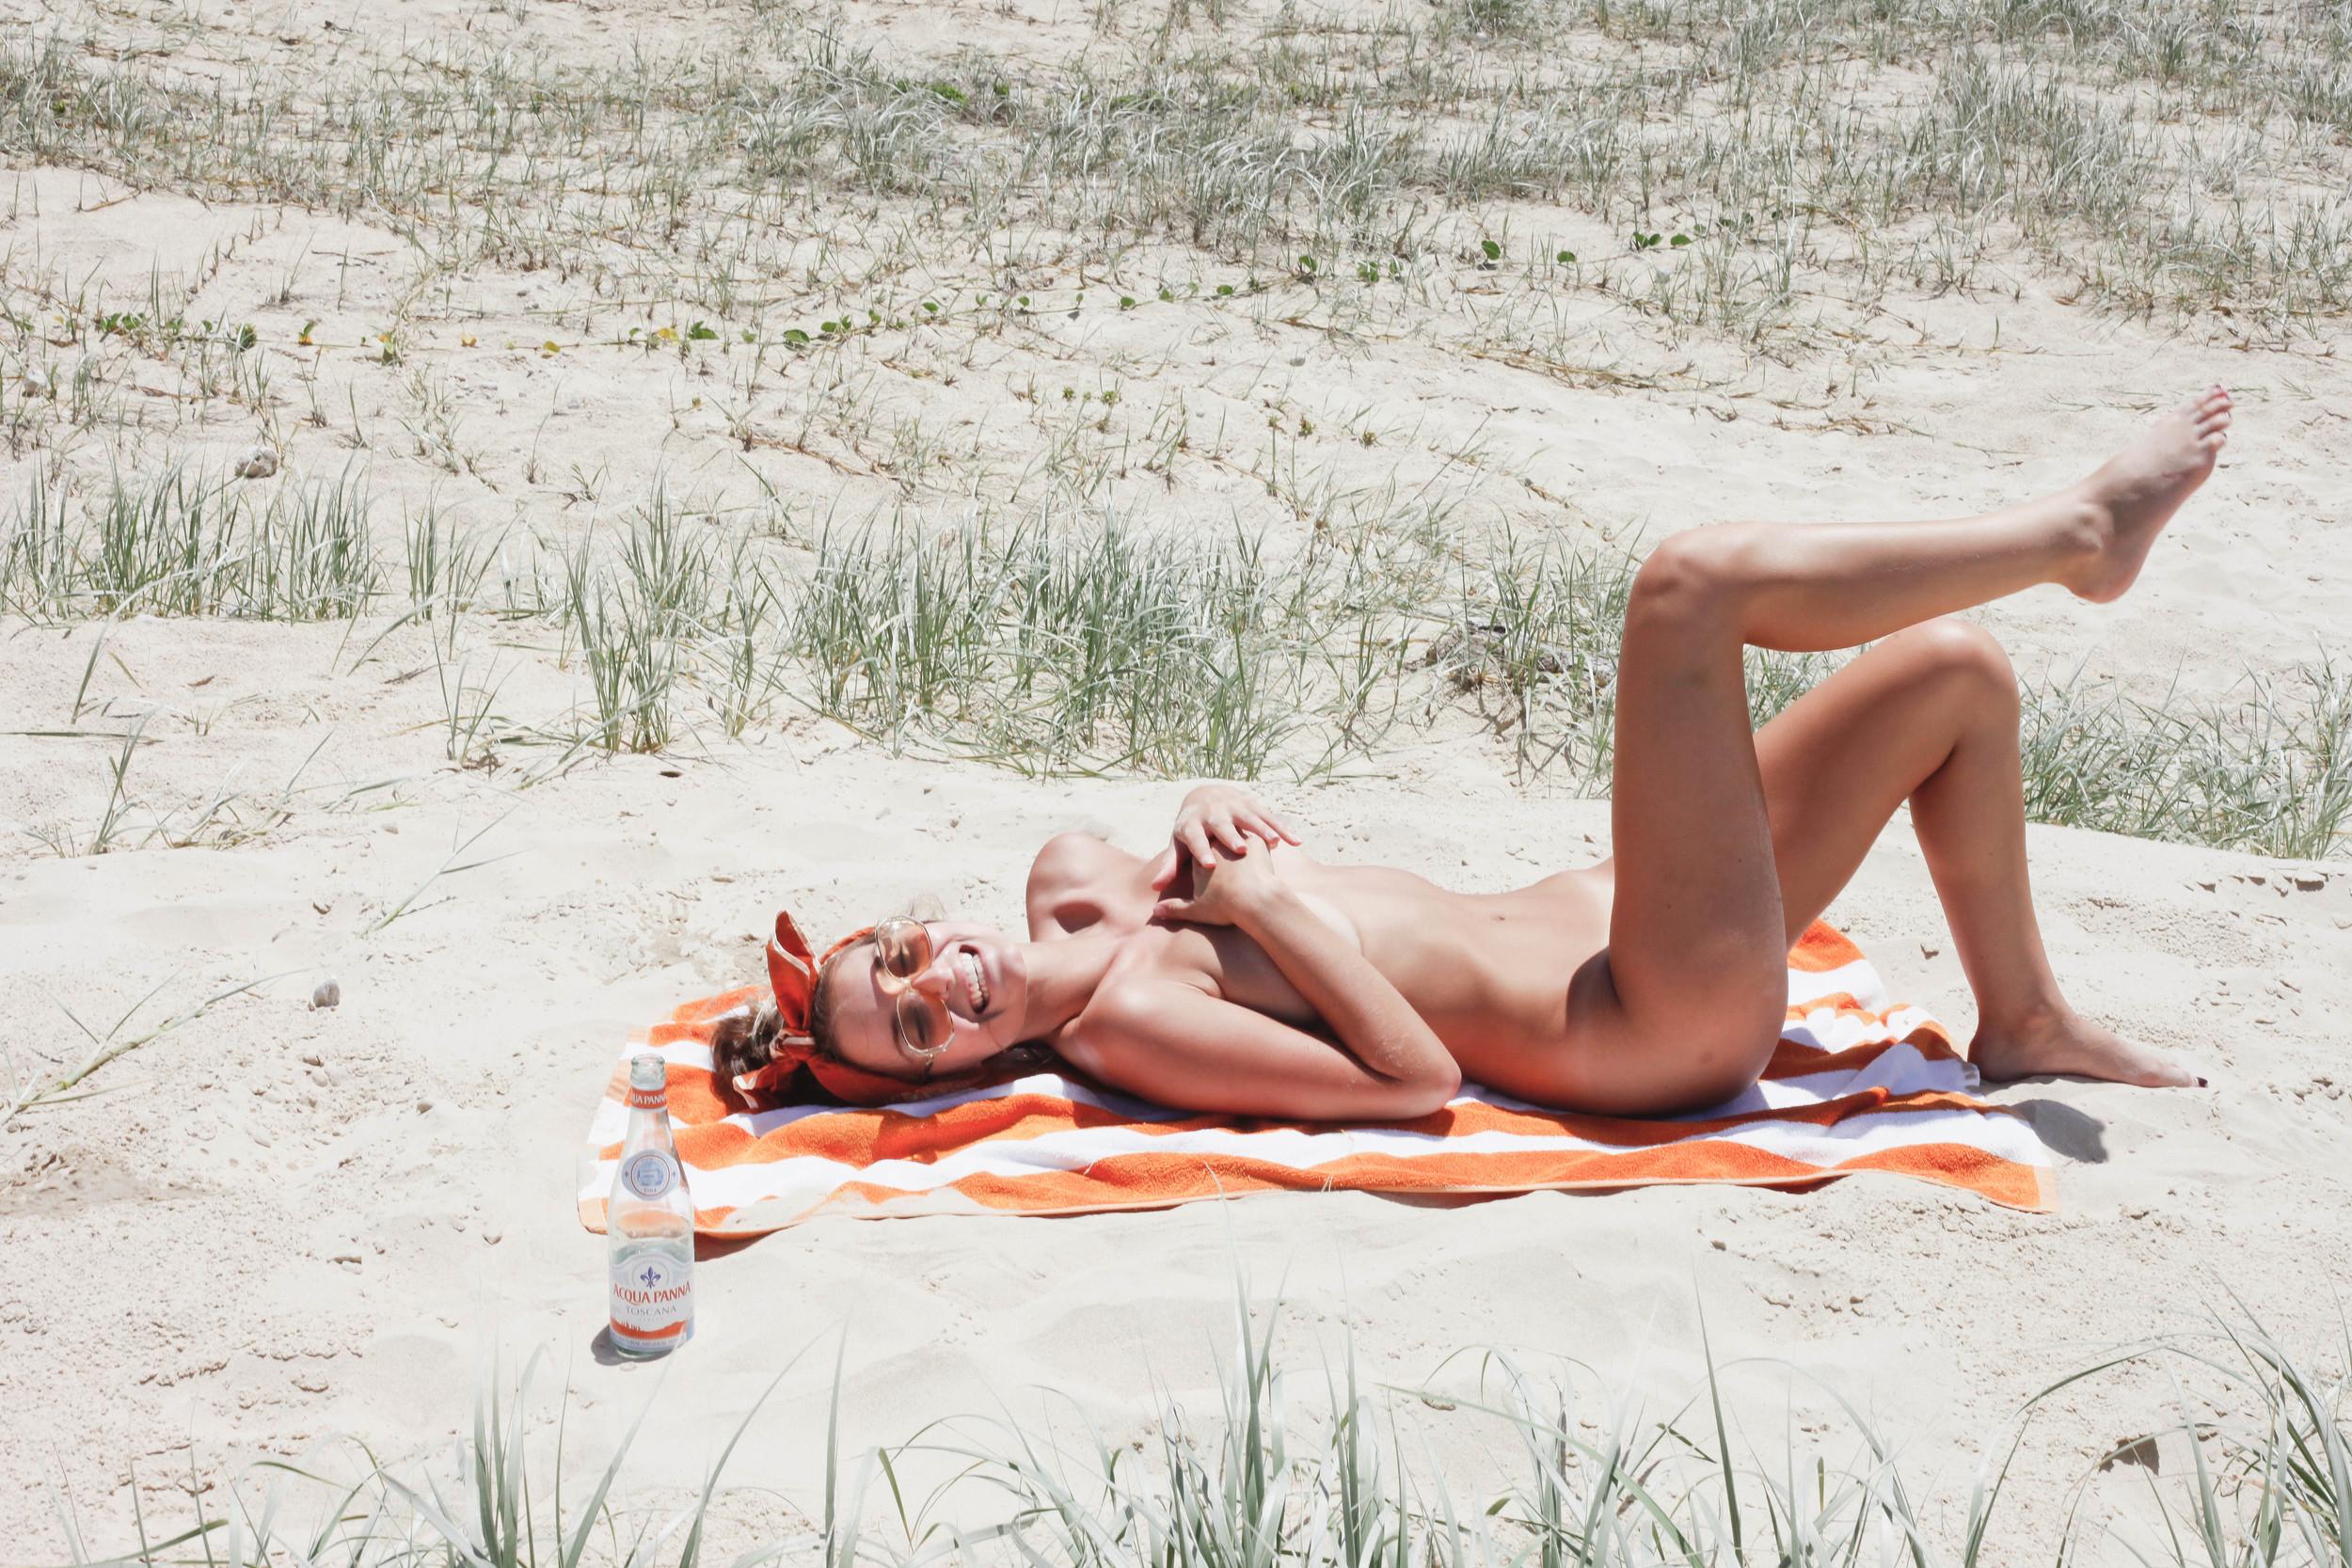 kate fenton nude beach